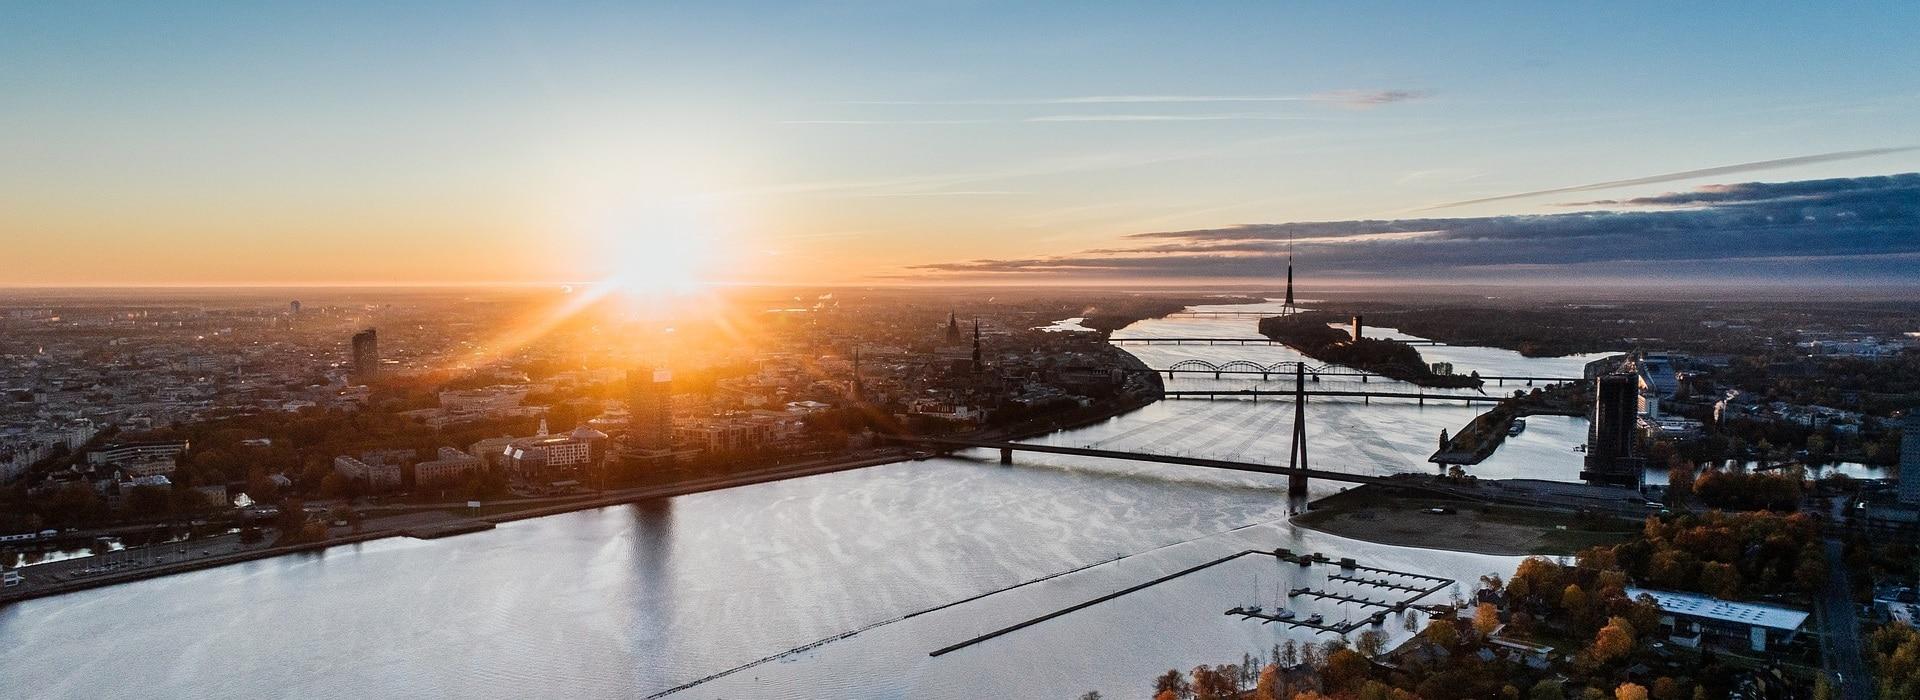 Lettland Header